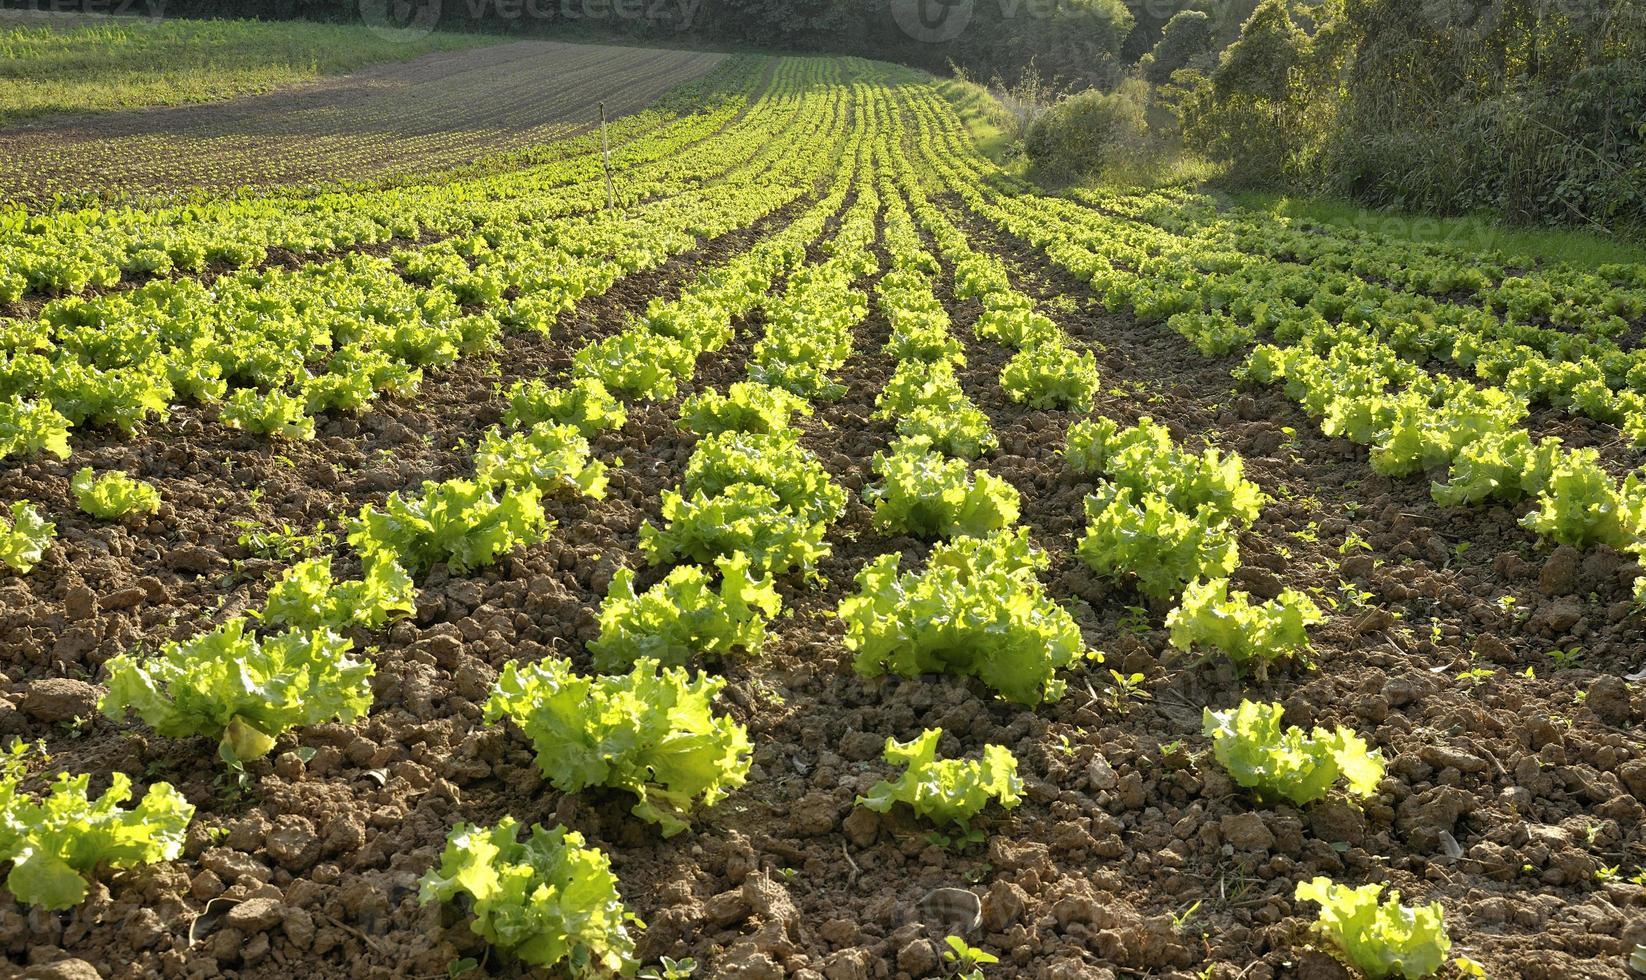 planting lettuce photo